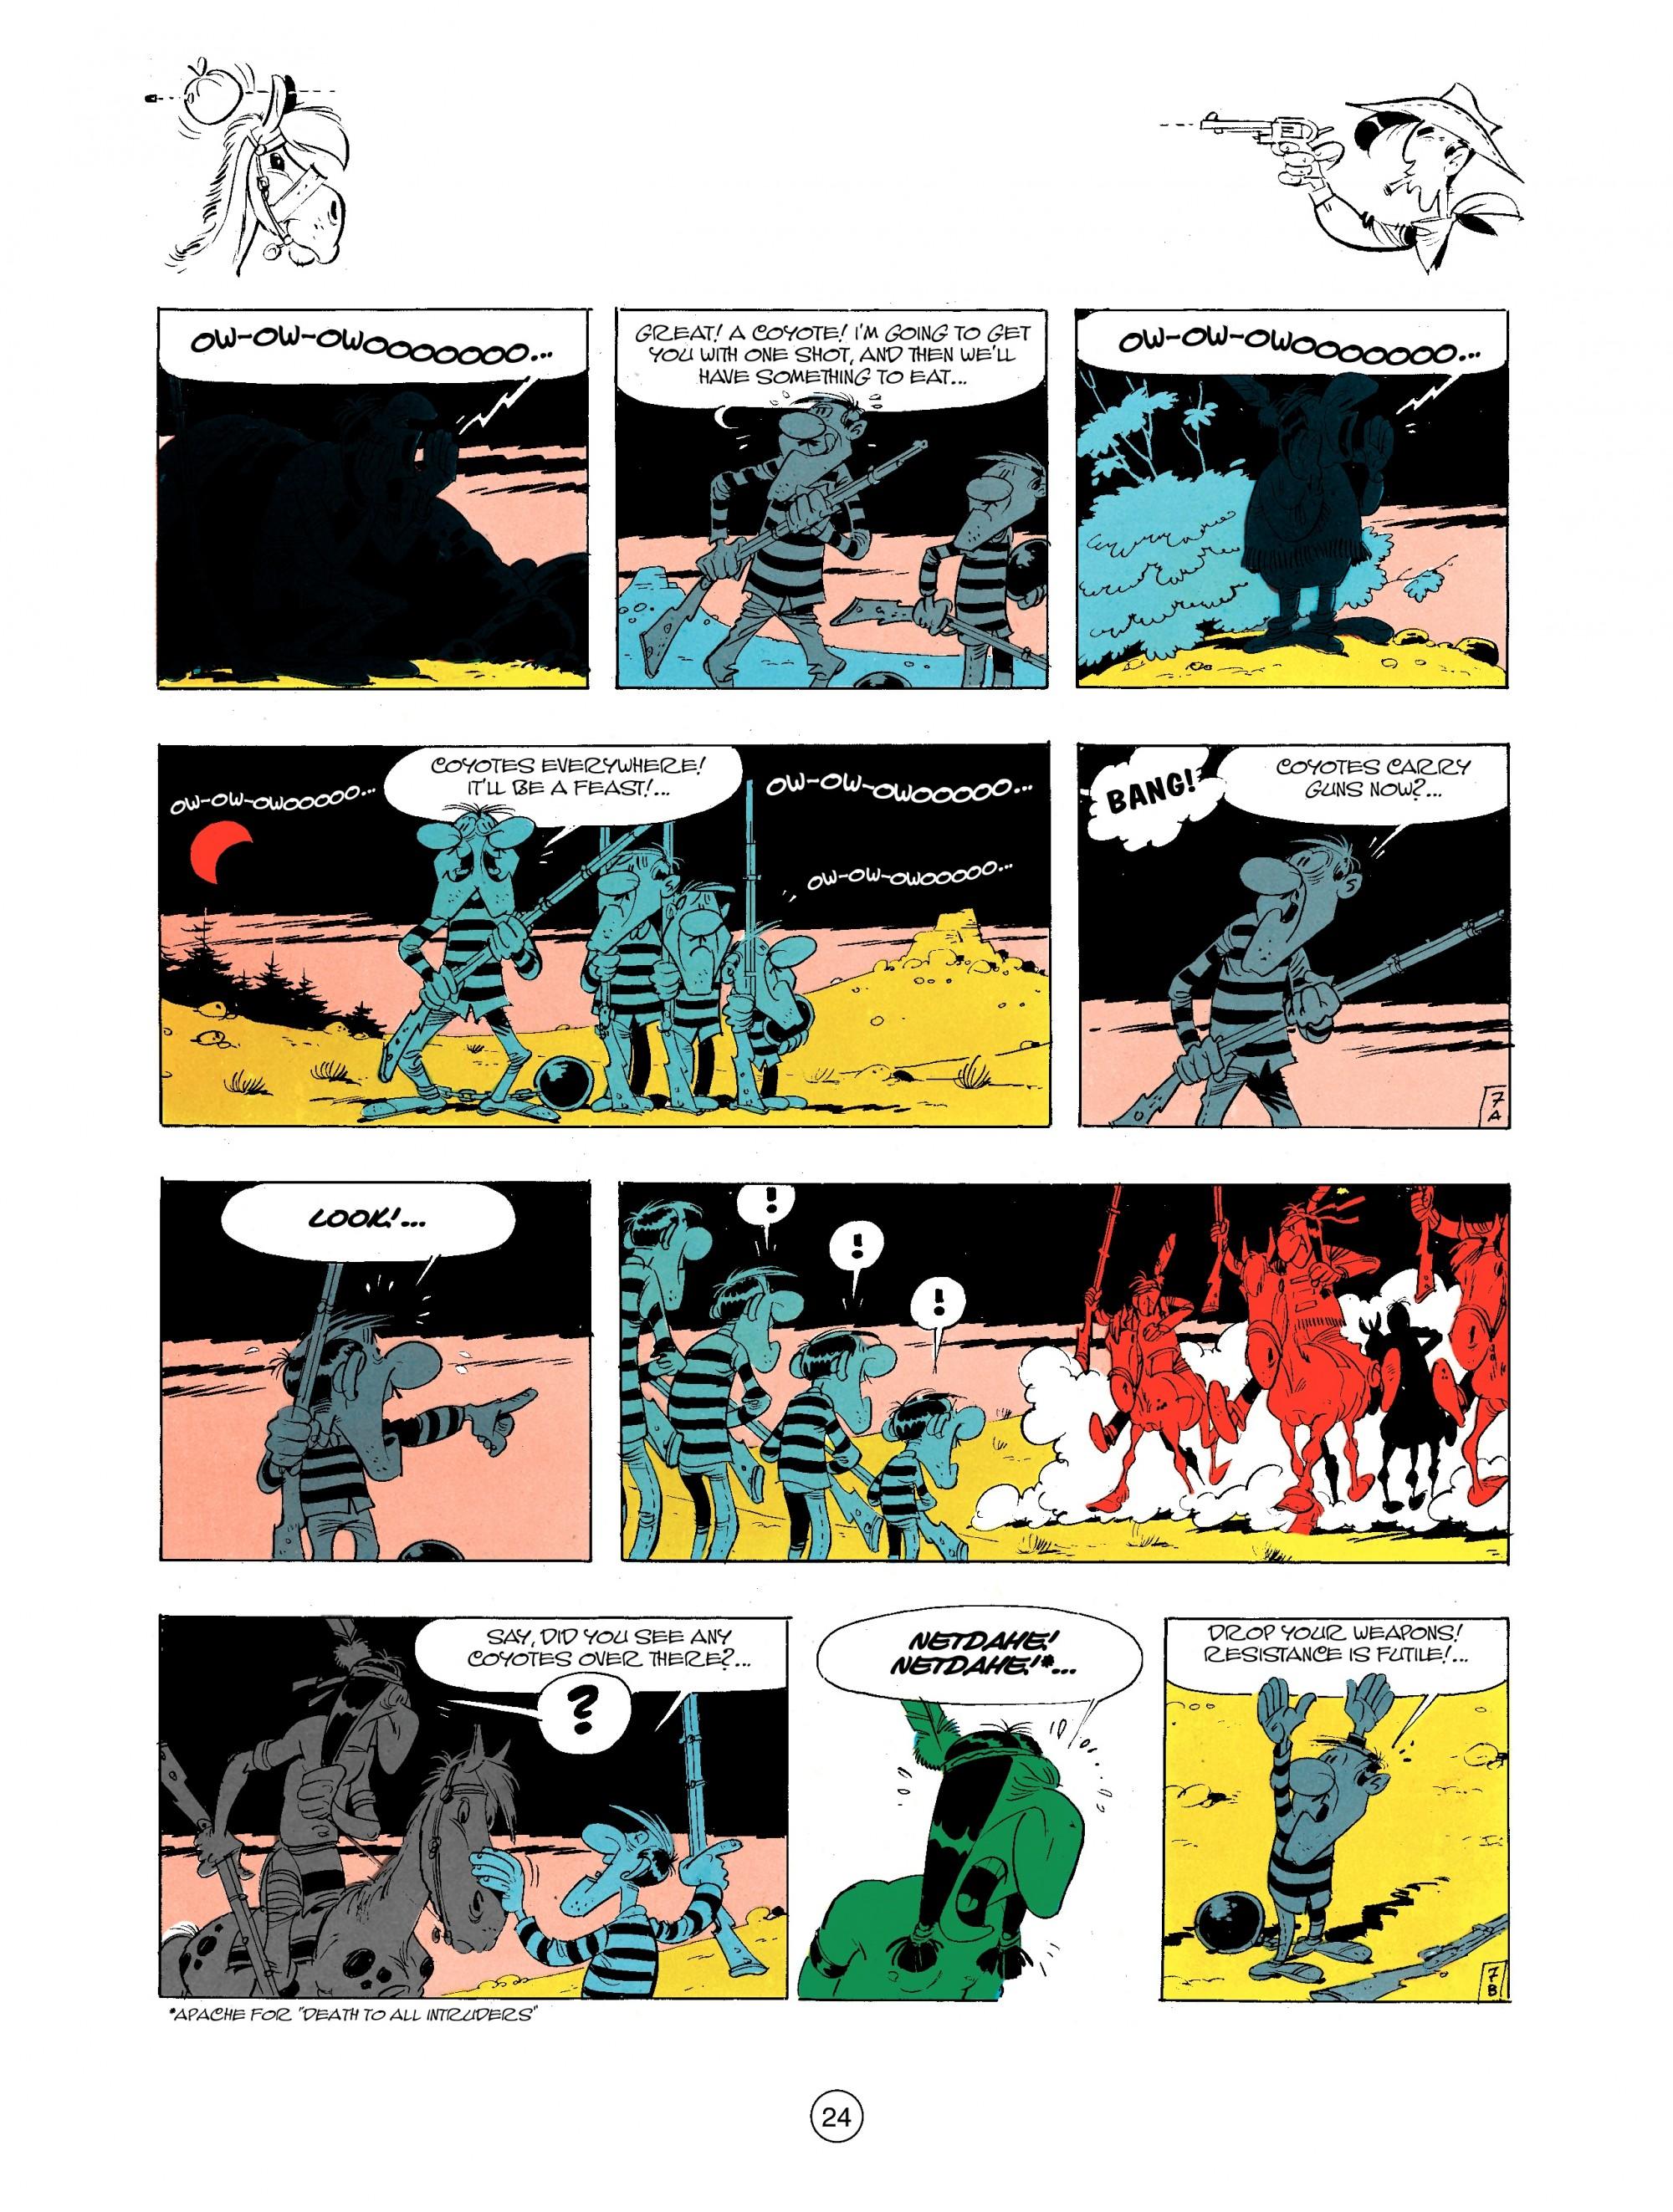 A Lucky Luke Adventure 34 Page 23